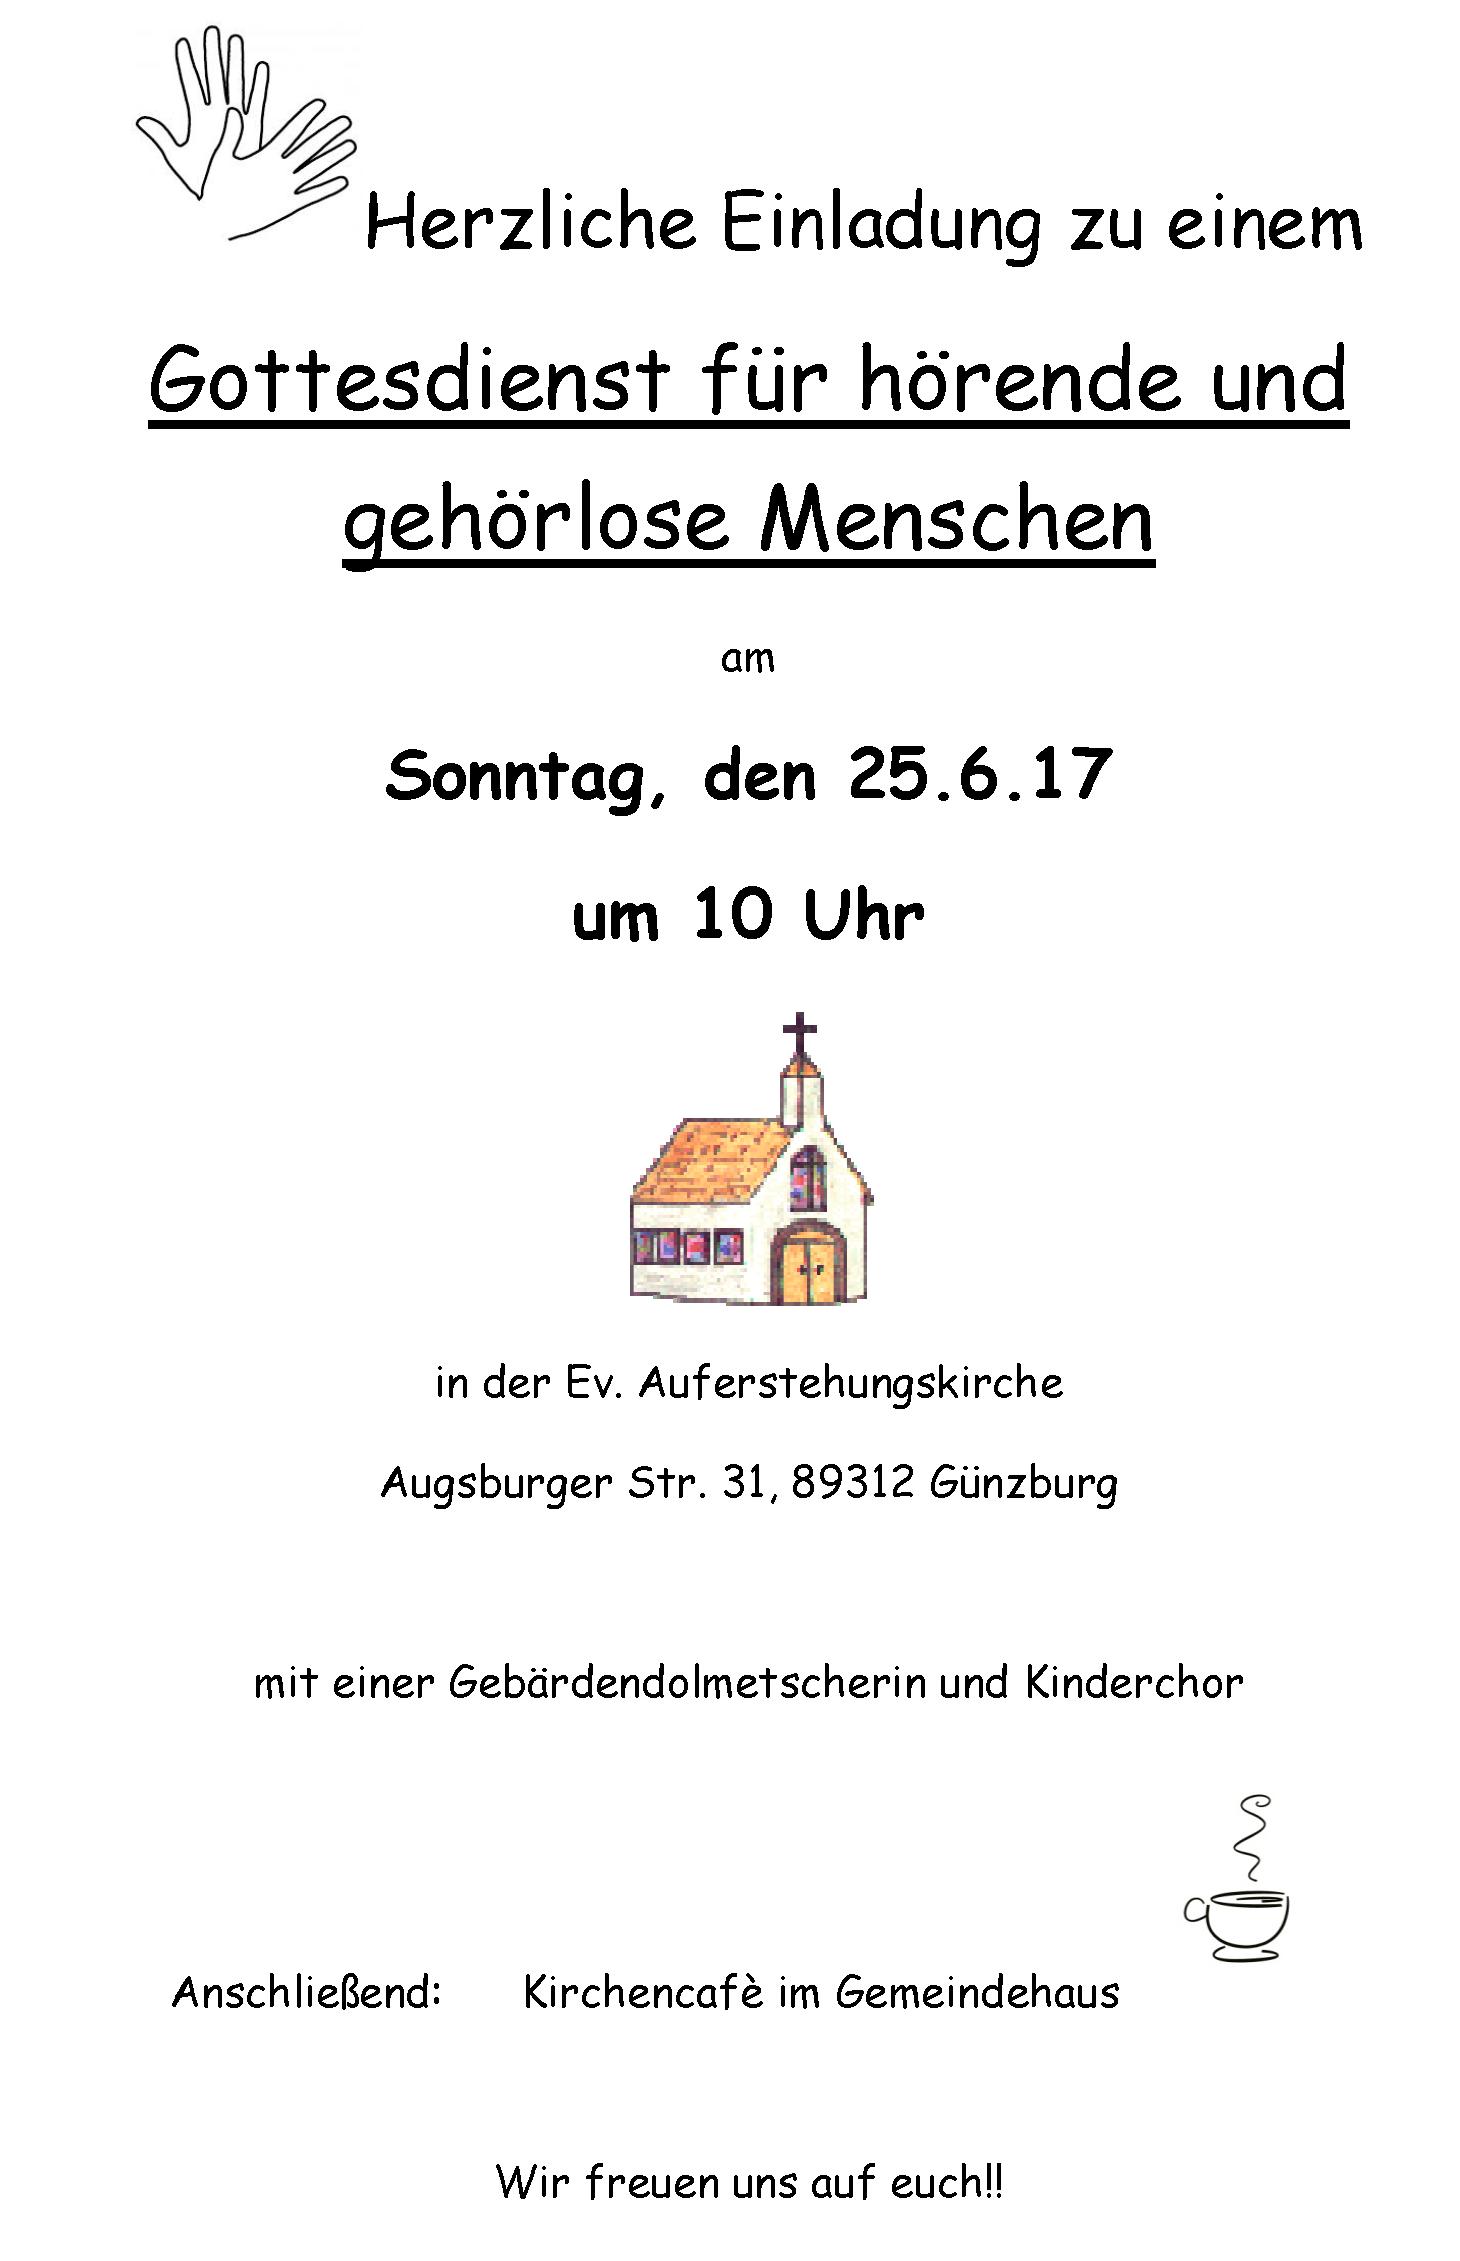 gehörlosenverein günzburg / neu-ulm e.v. - news, Einladung